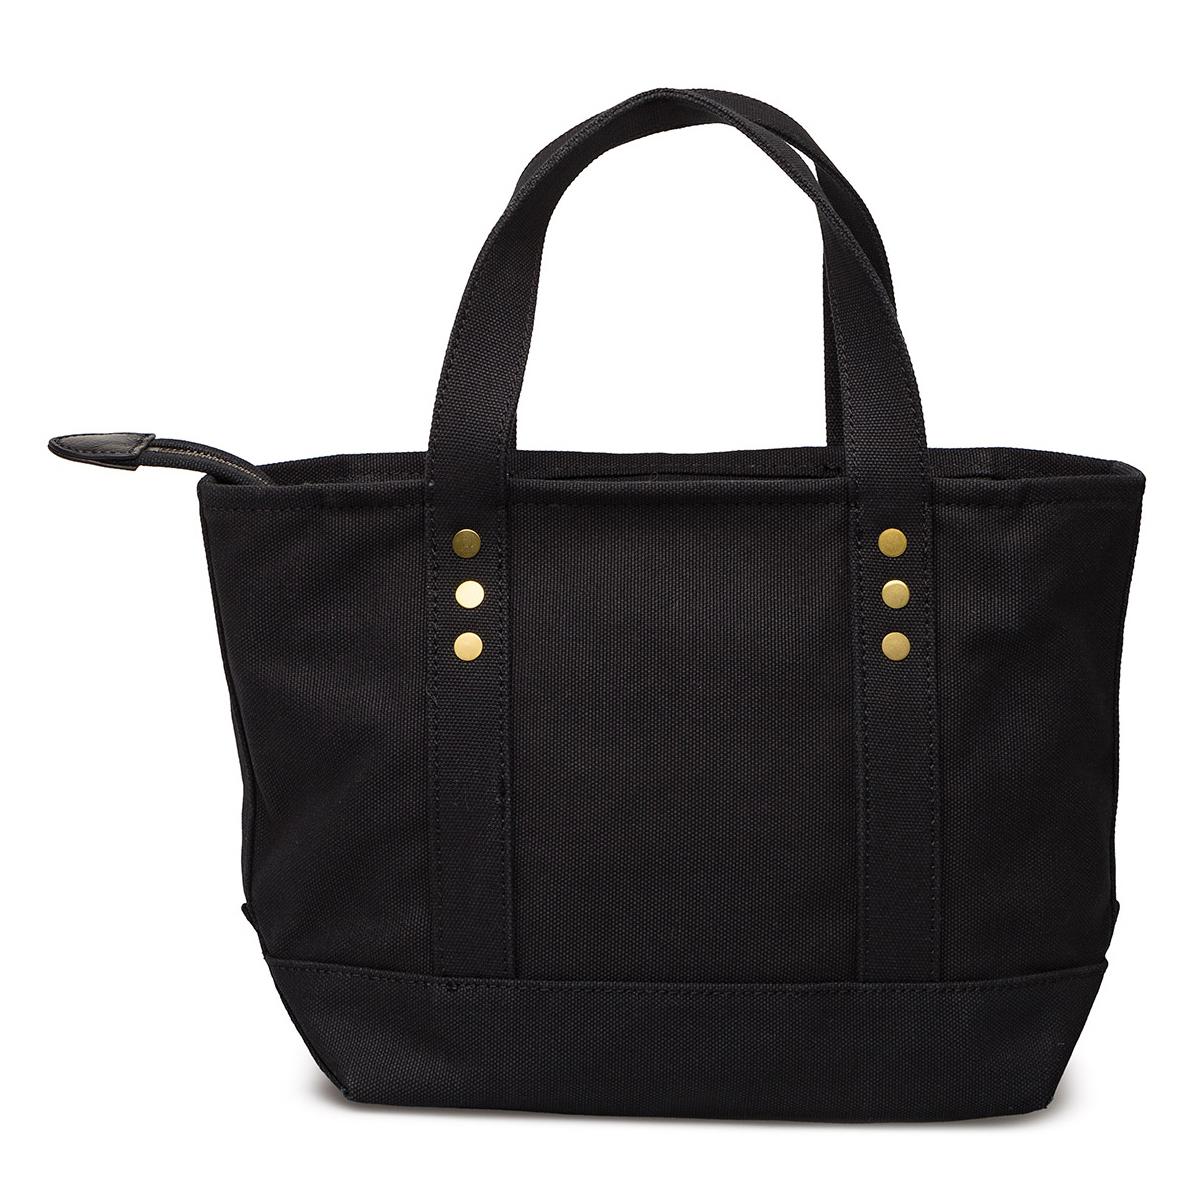 b70f2bf9ed4a Brand 20 generations stylish on polo Ralph Lauren Polo Ralph Lauren handbag  tote bag shoulder bag Lady s men canvas purse tote bag shoulder back black  black ...